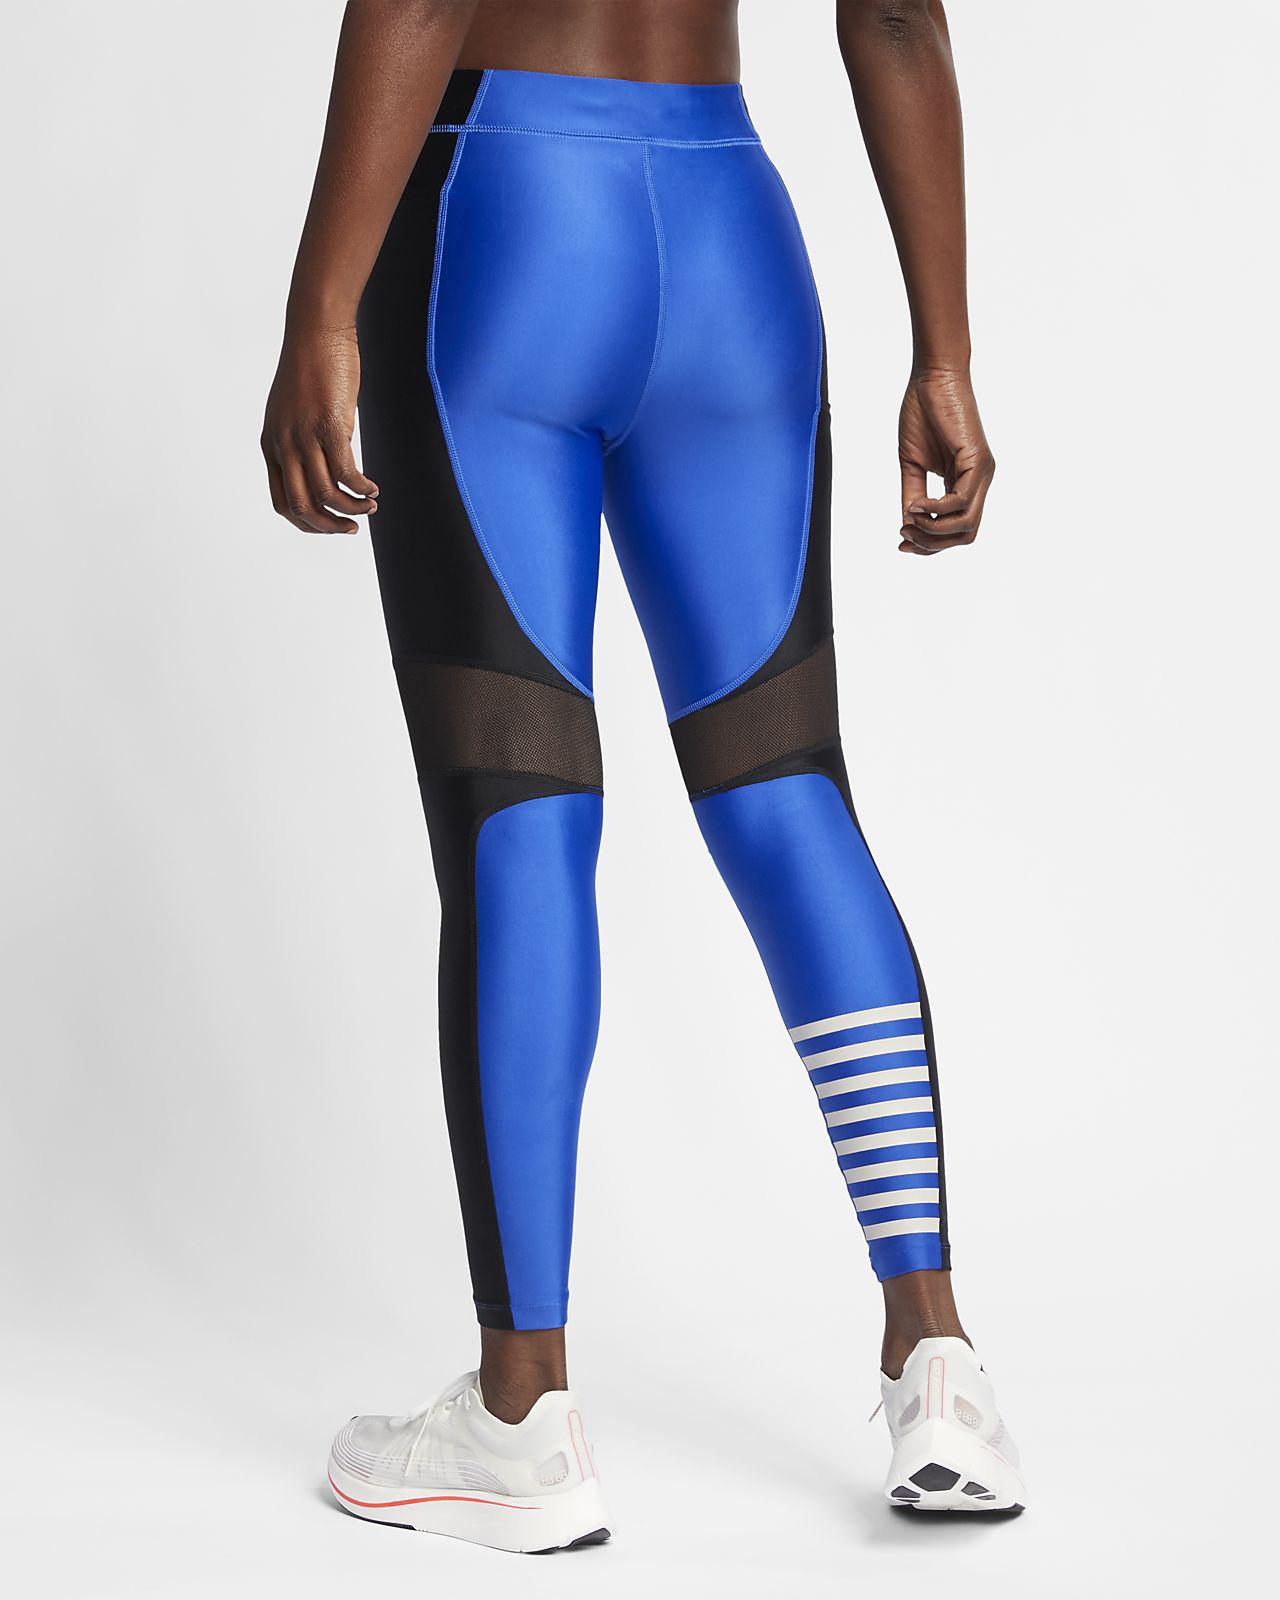 5b2f7ac1fdcd Γυναικείο κολάν 7 8 για τρέξιμο Nike Power Speed. Nike.com GR